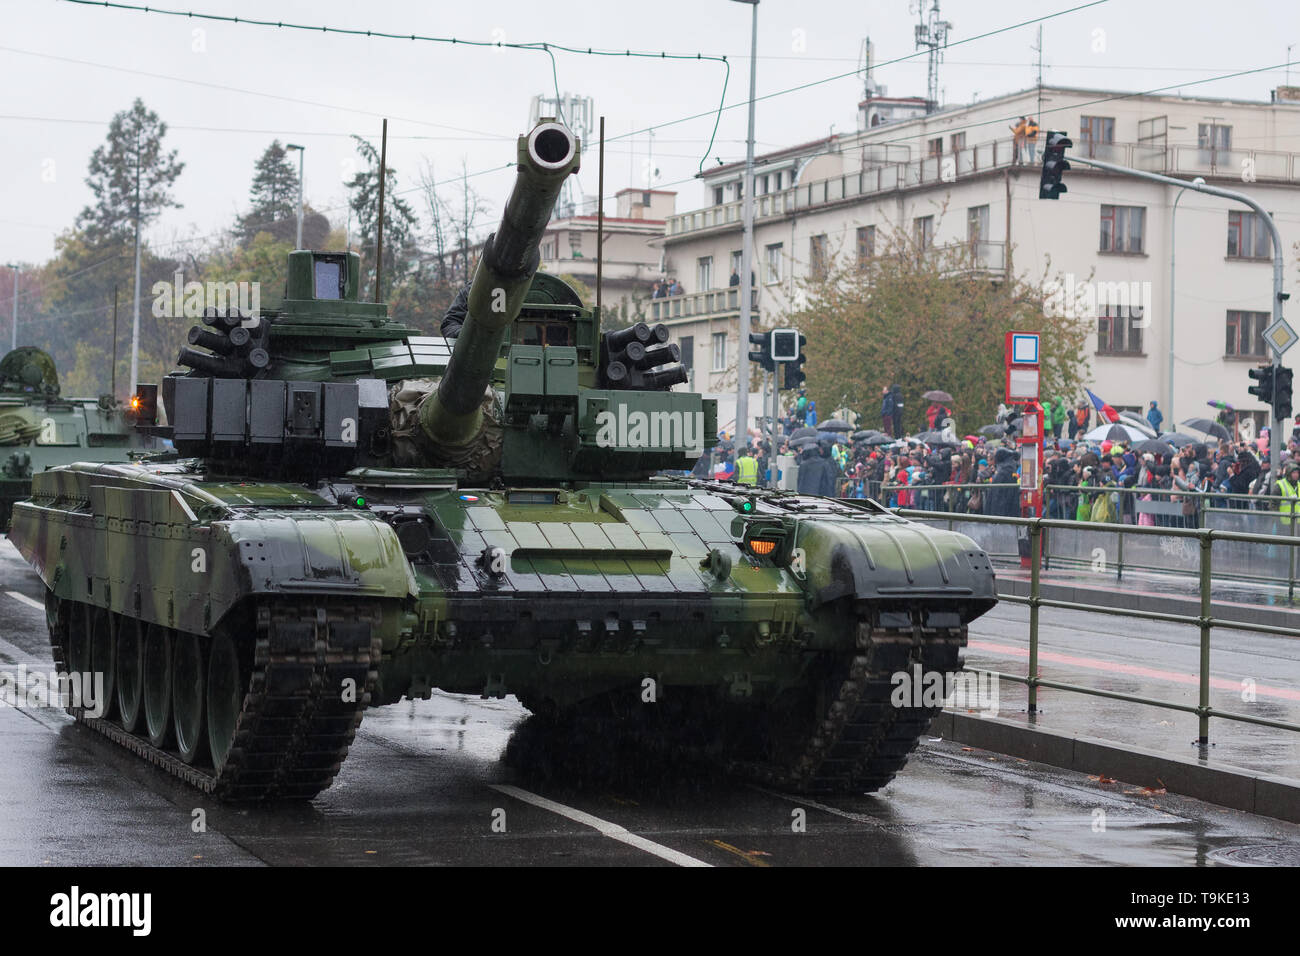 Main battle tank  on military parade  in Prague, Czech Republic - Stock Image